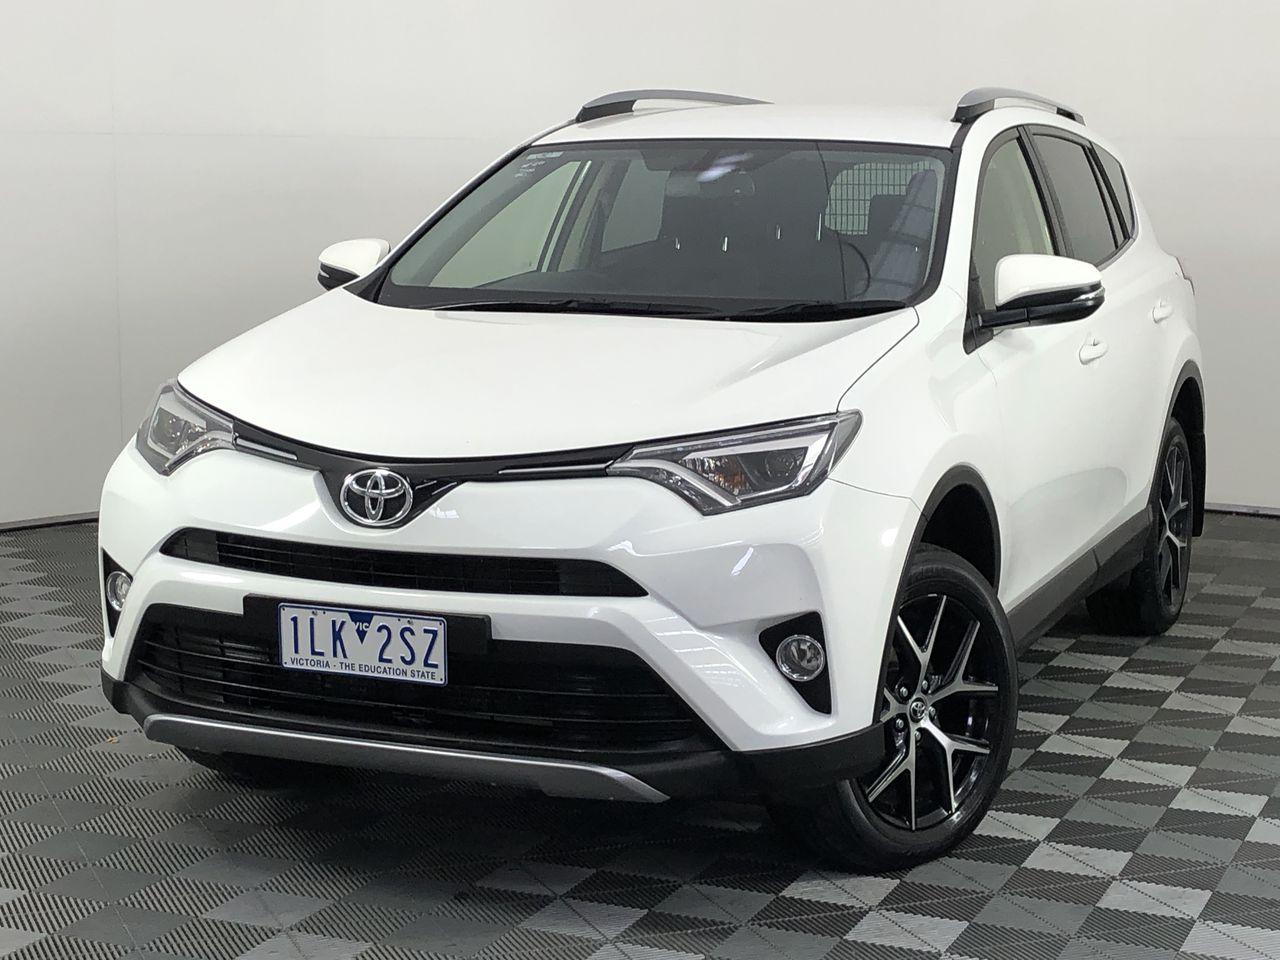 2017 Toyota Rav 4 AWD GXL ASA44R Automatic Wagon (EX GOV)